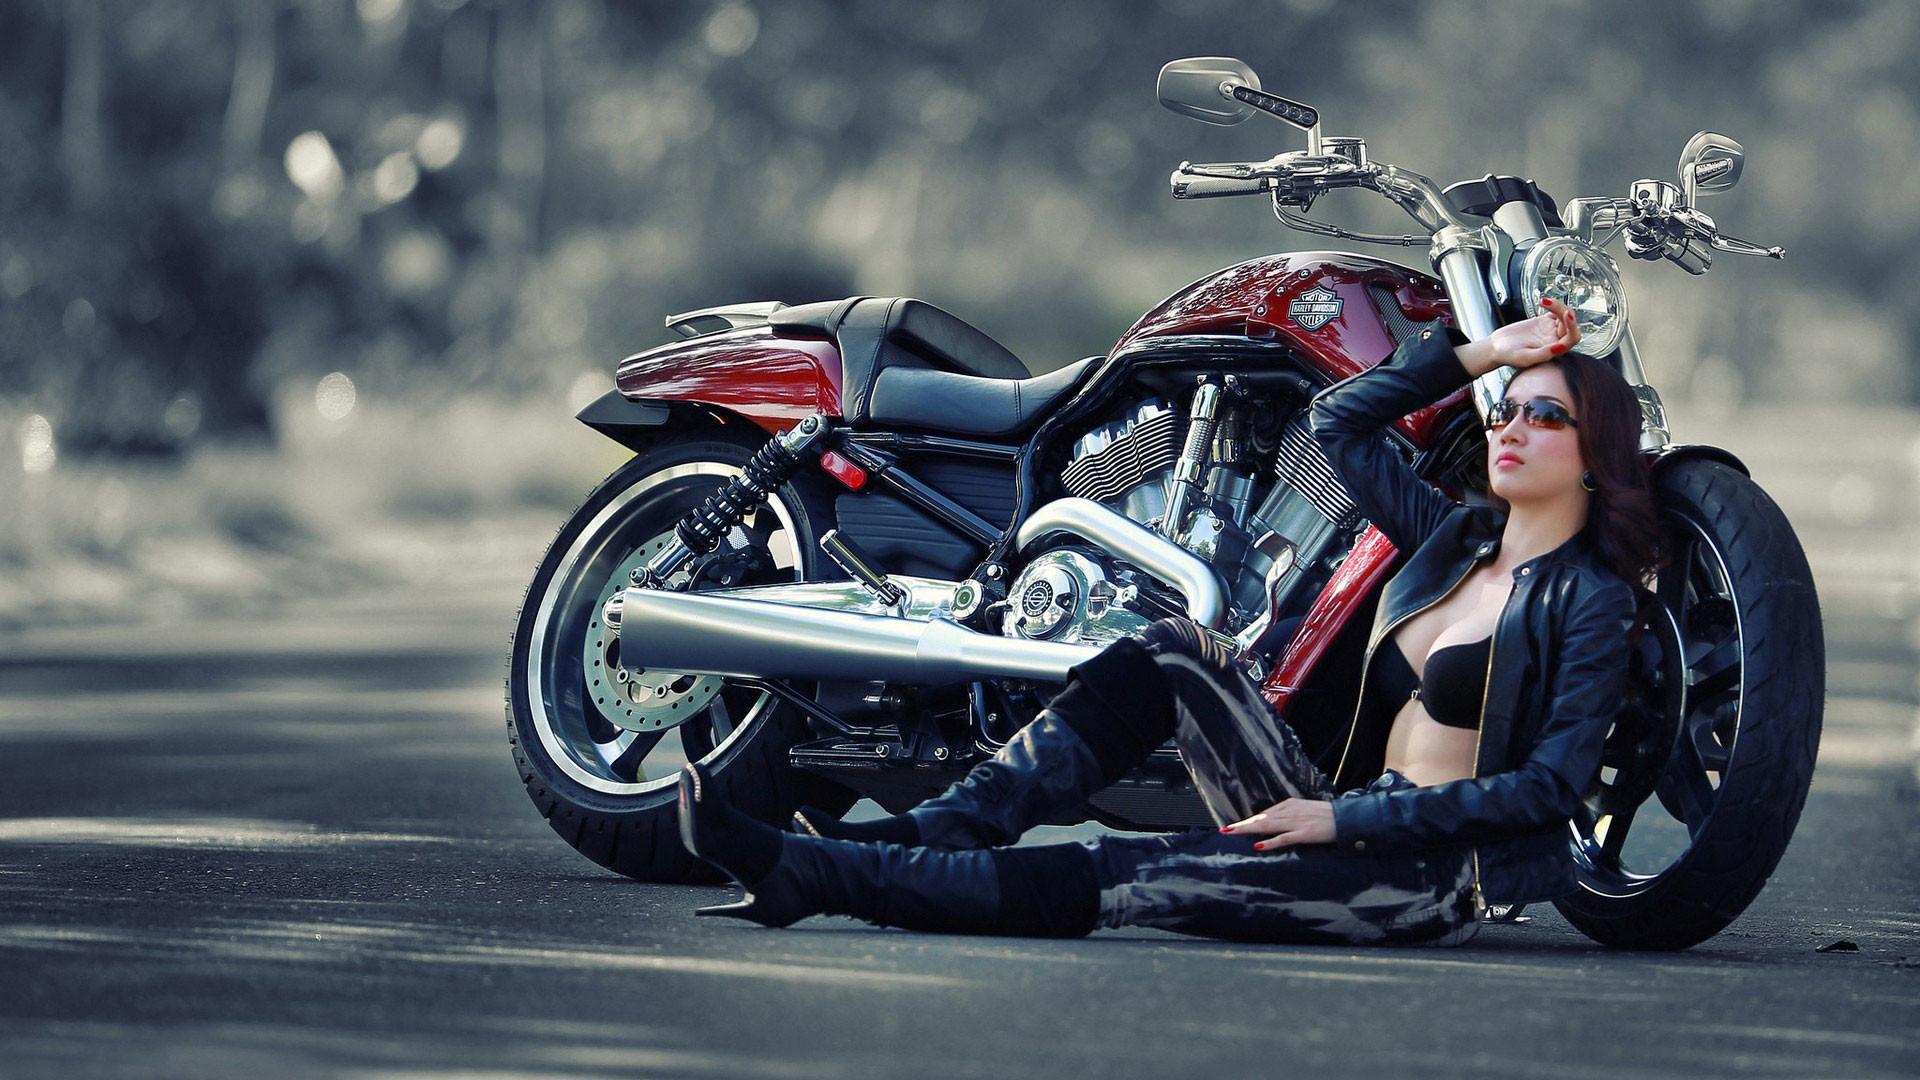 hd-pics-photos-bikes-girl-desktop-background-wallpaper